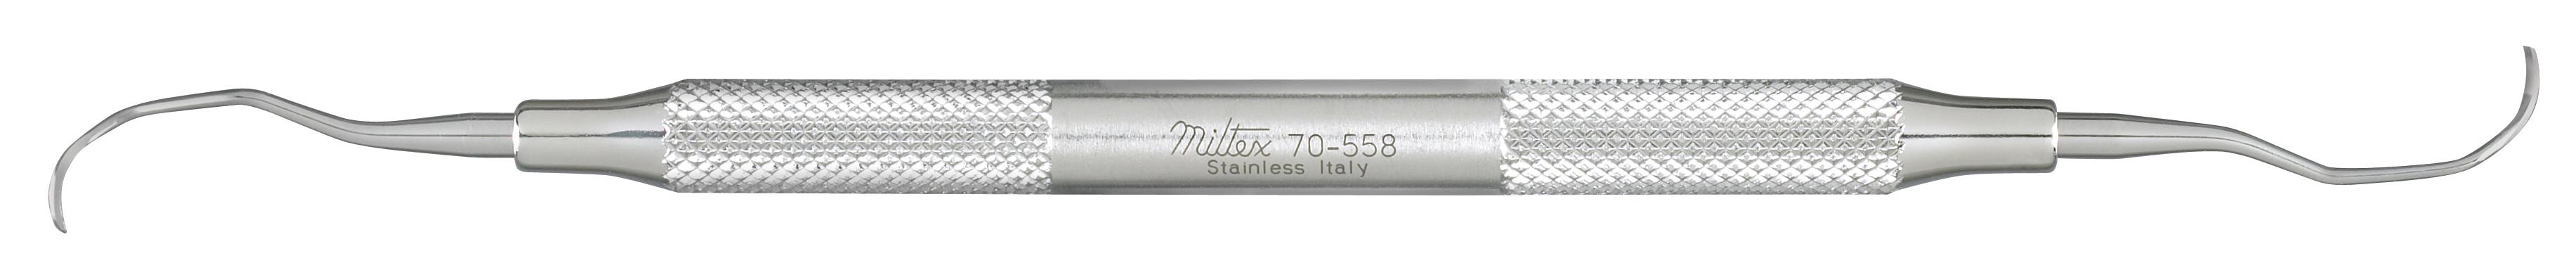 langer-3-4-curette-lightweight-handle-70-558-miltex.jpg